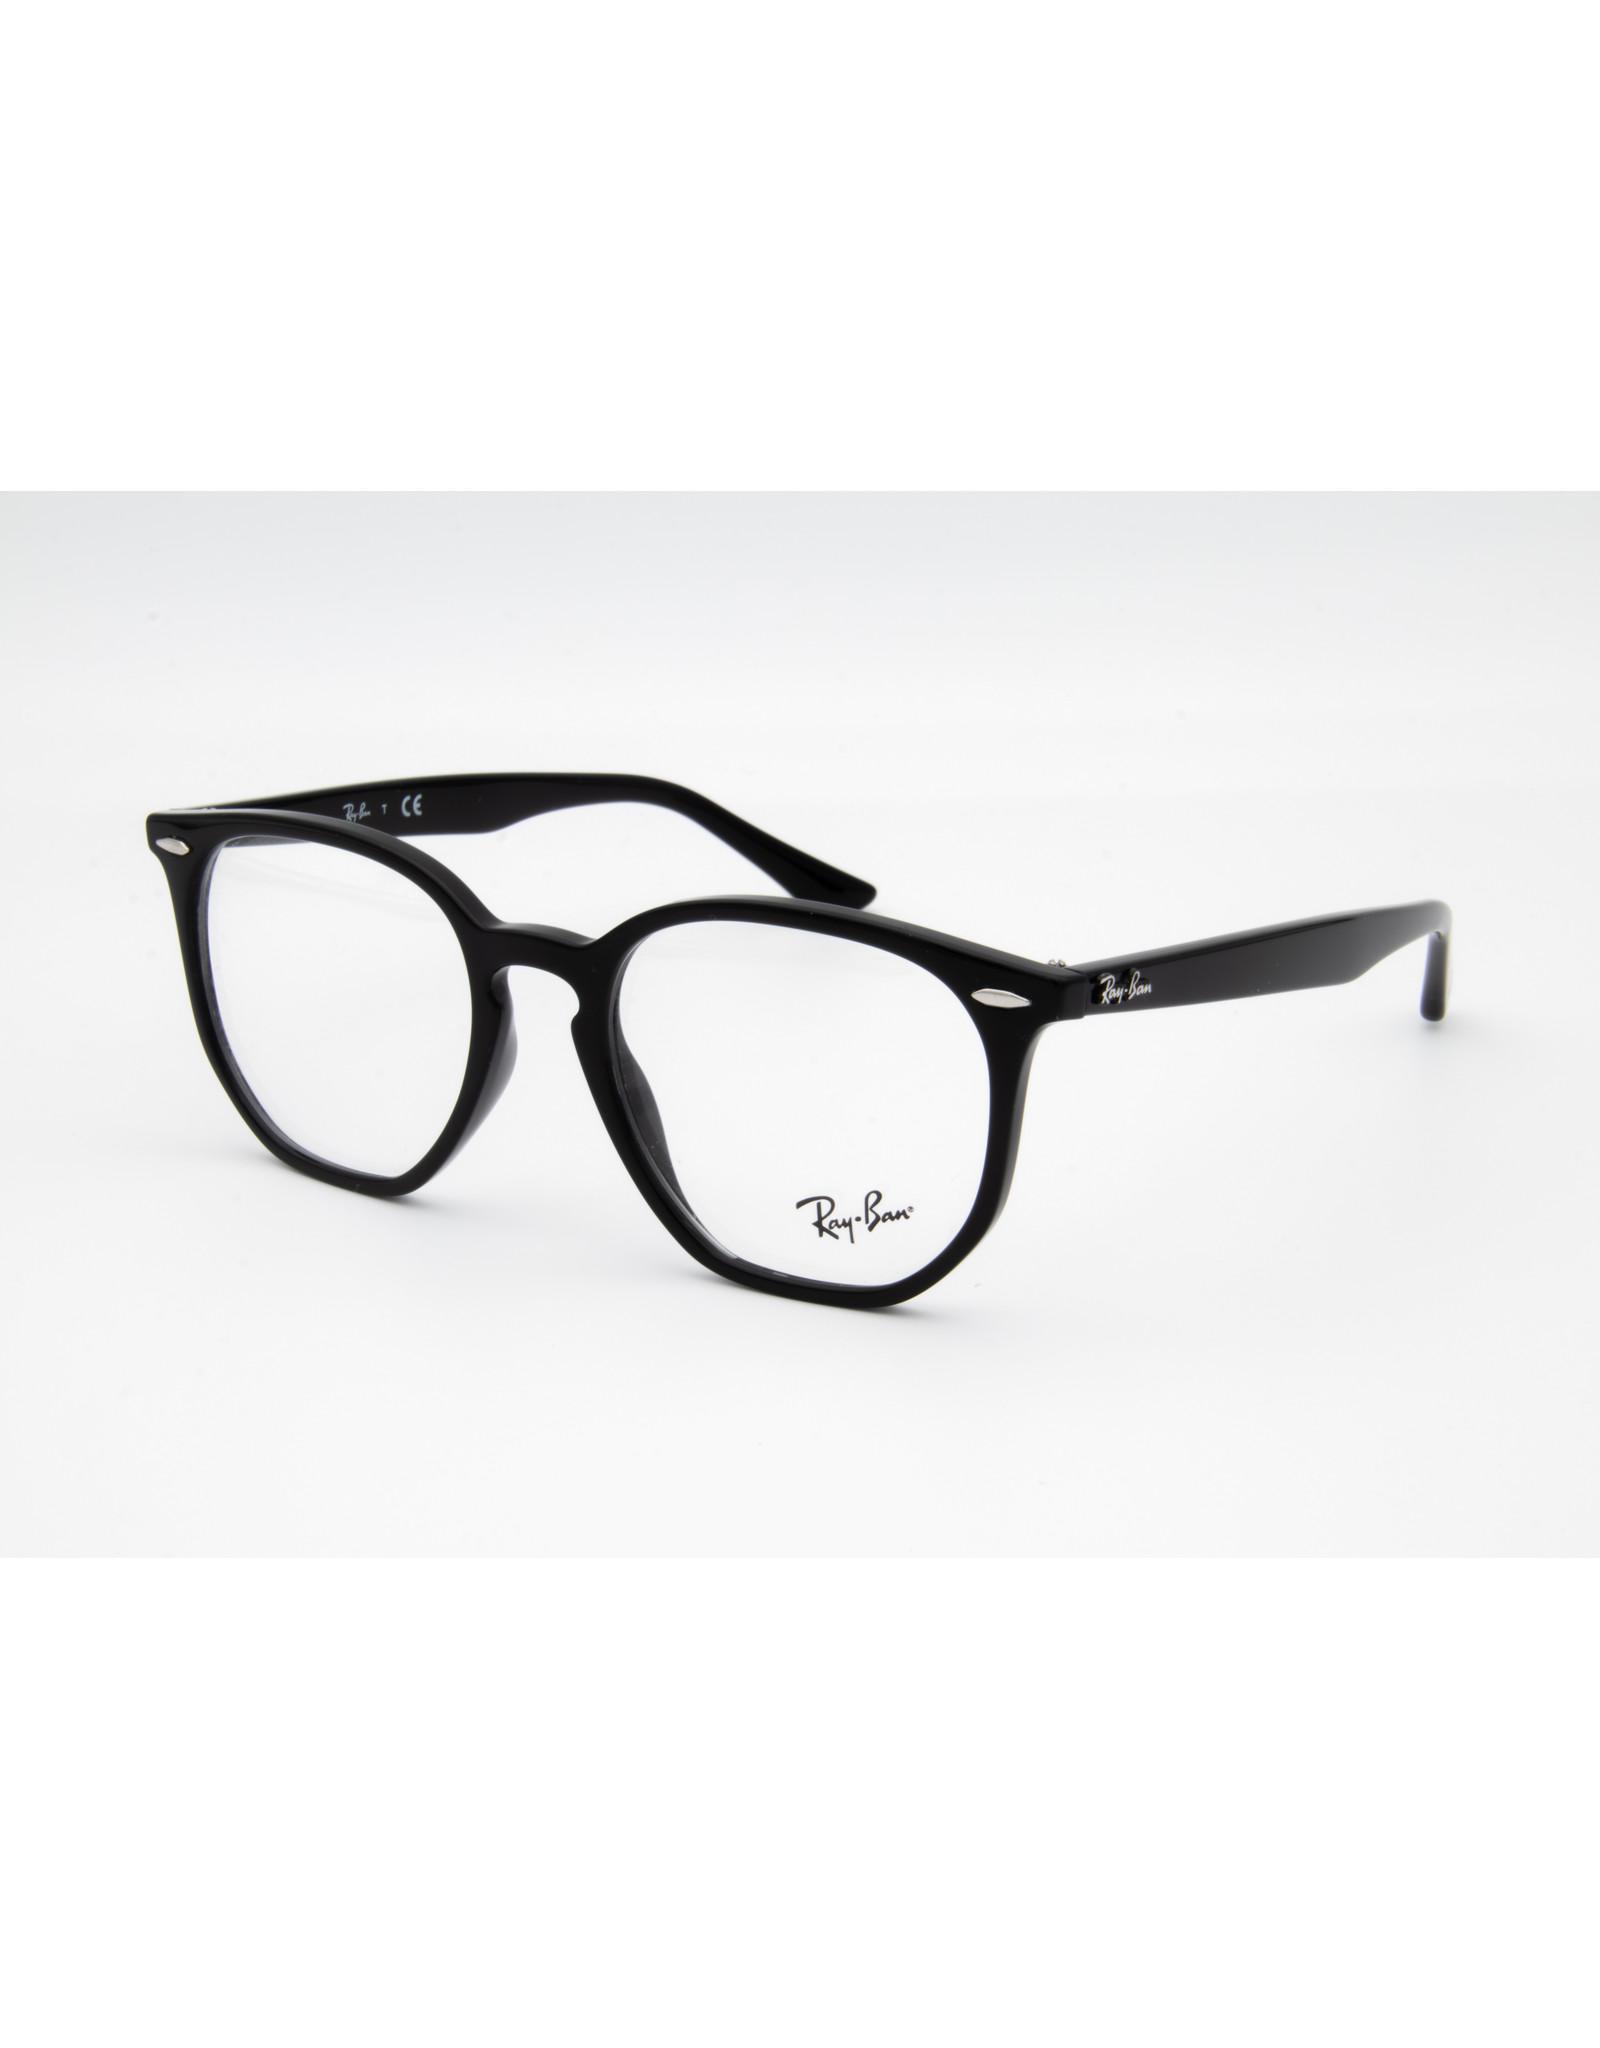 Ray-Ban rb7151 2000 (black)